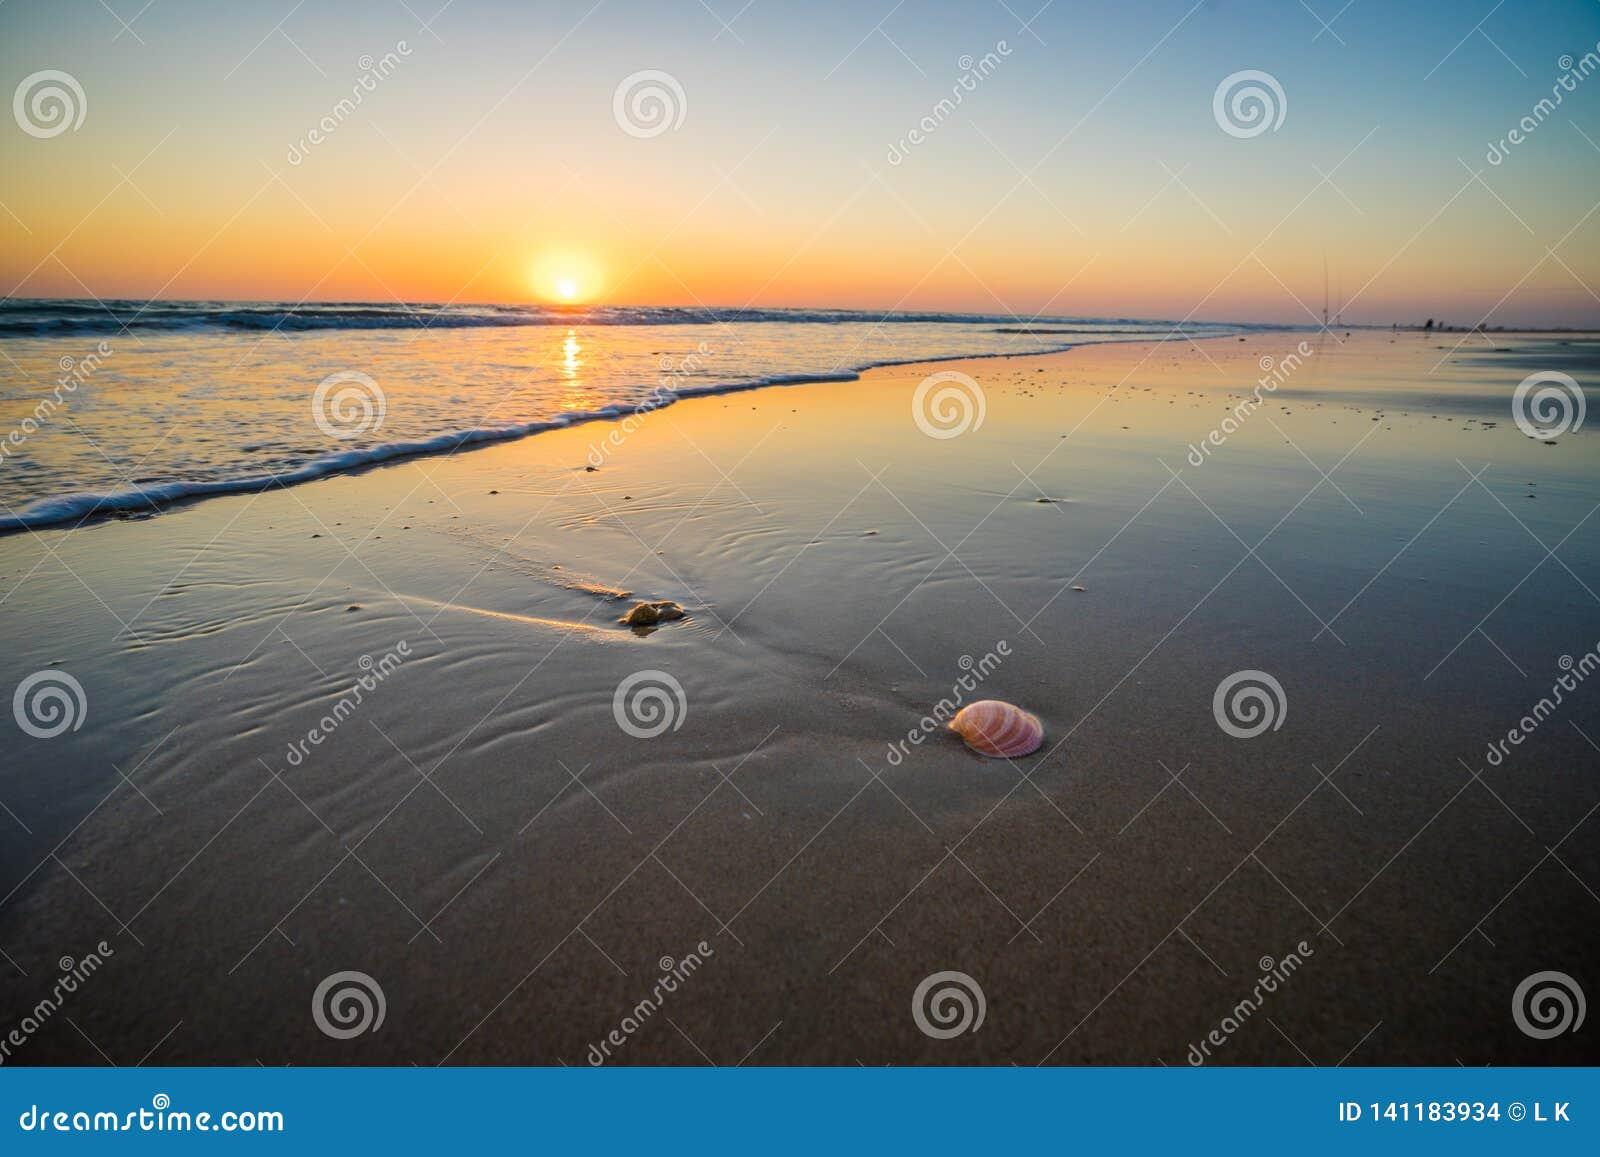 Sunset at beach in cadiz Spain